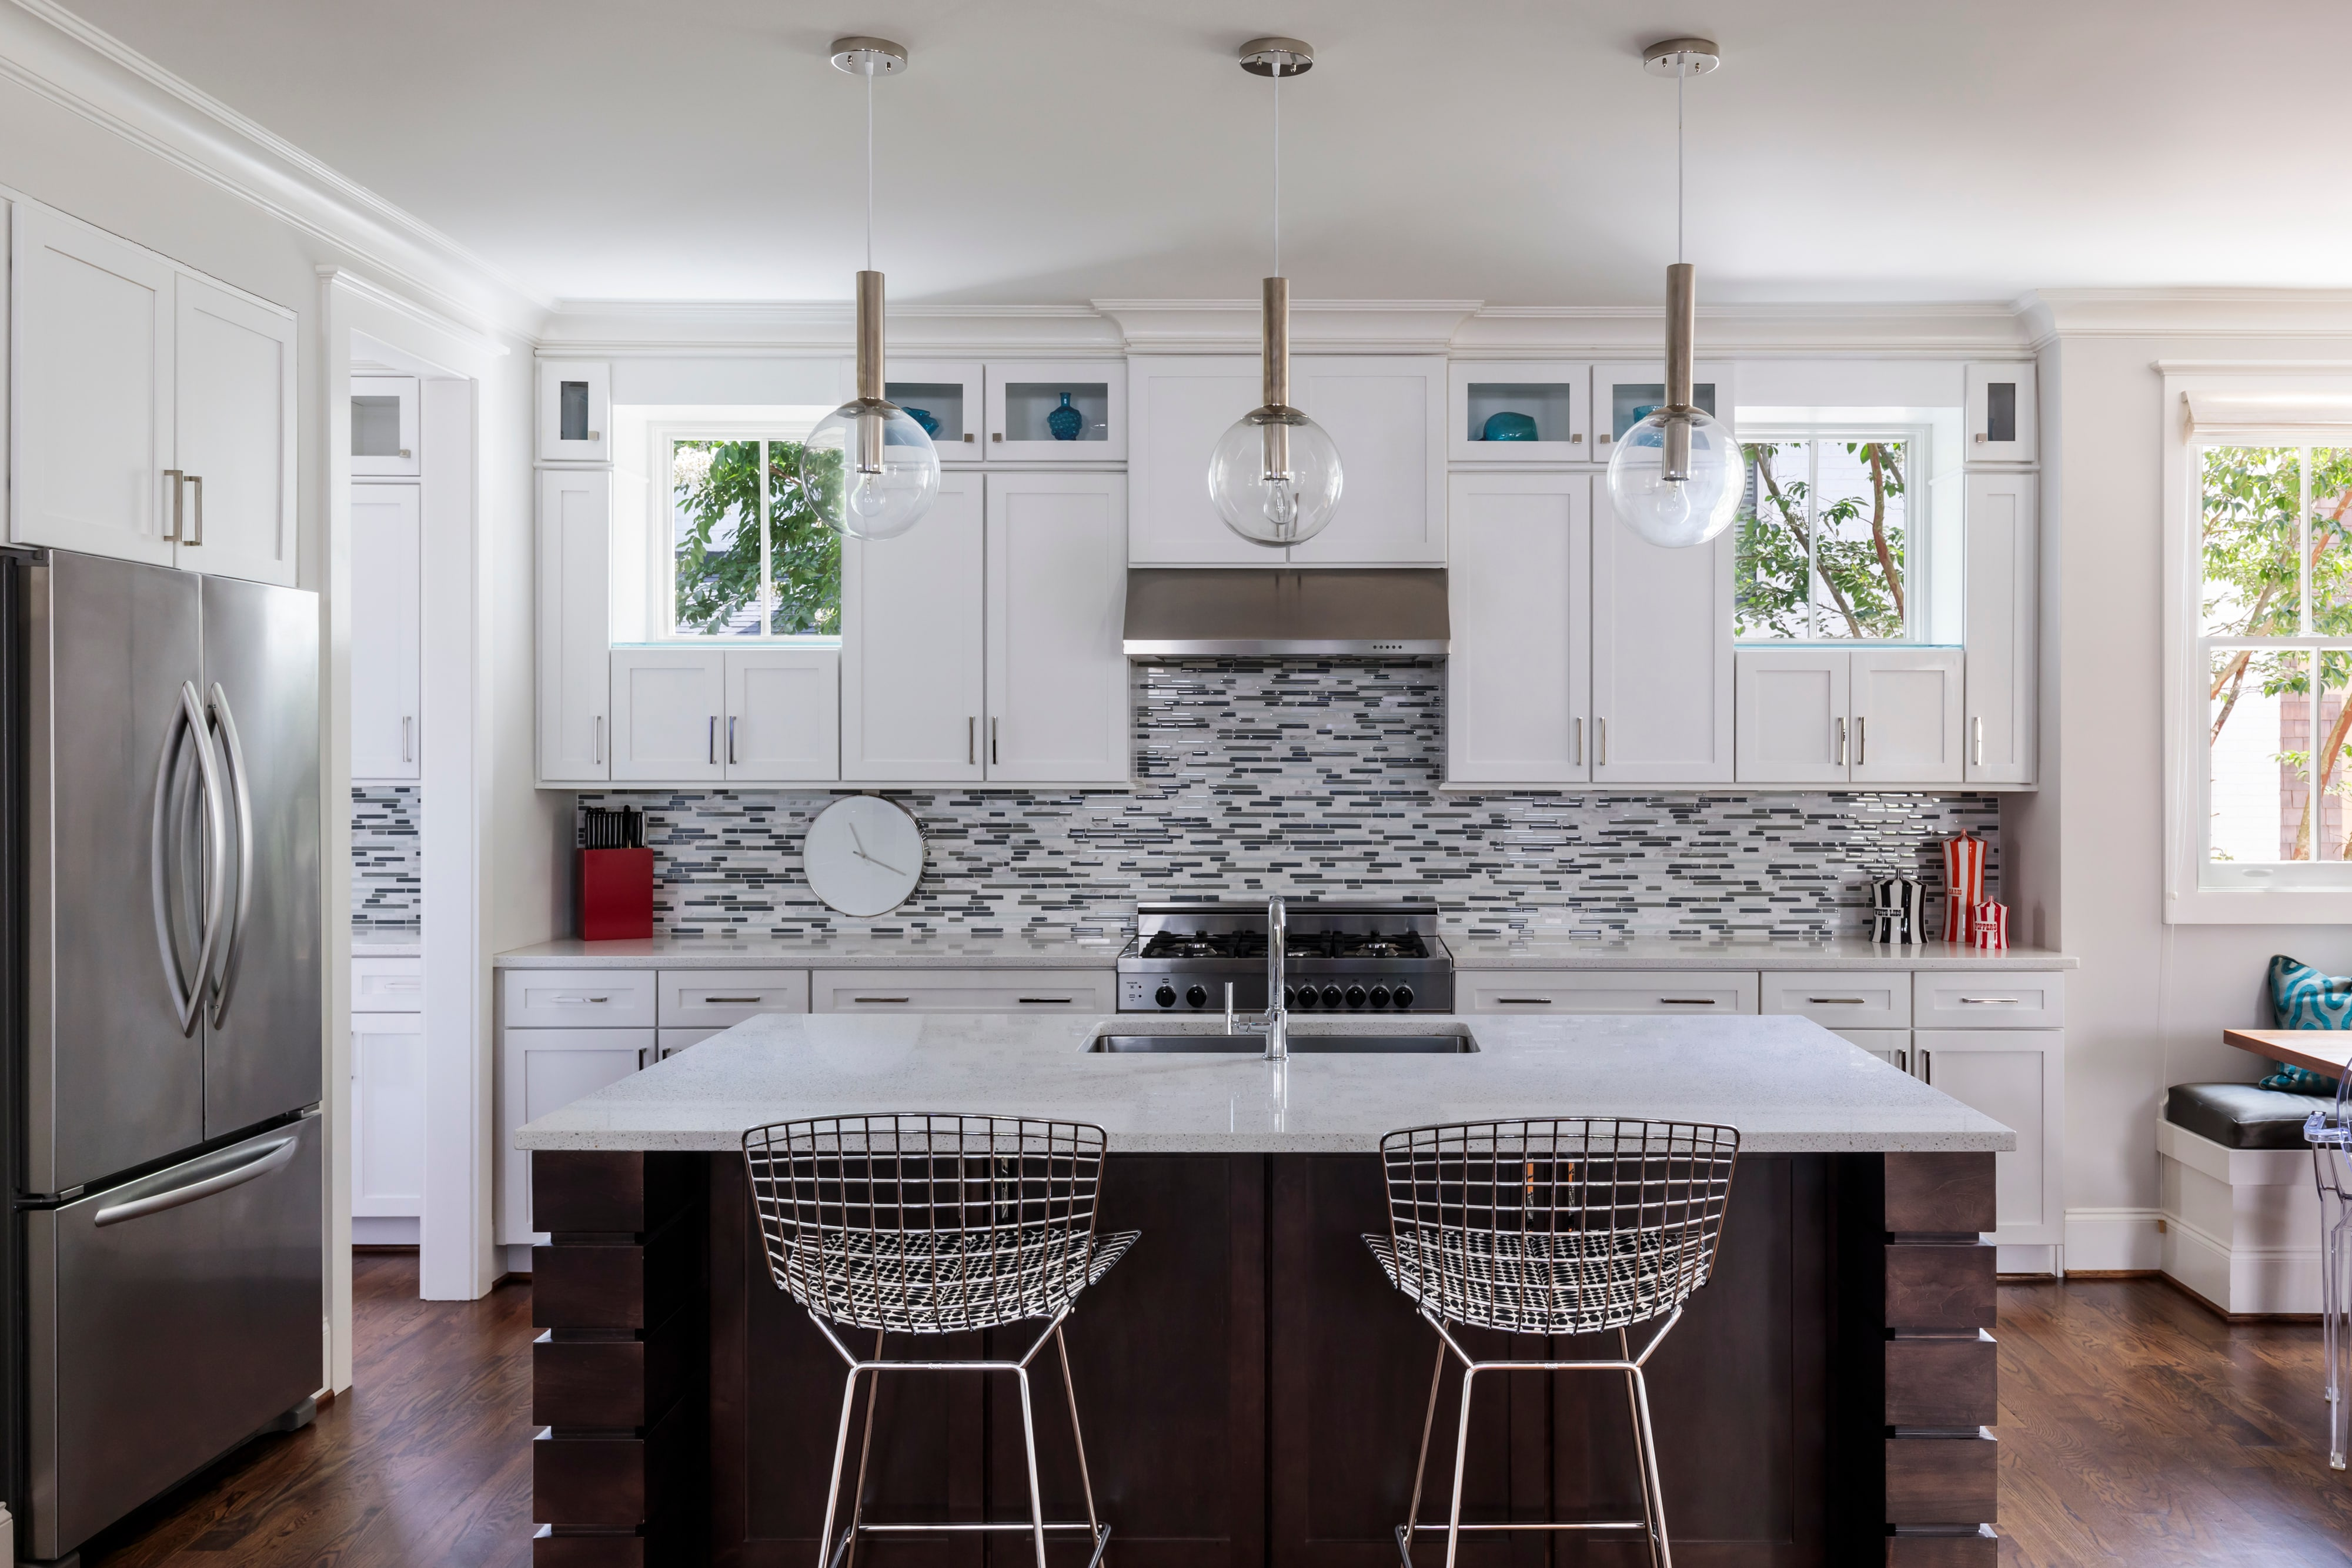 Barové stoličky do kuchyne - #1008